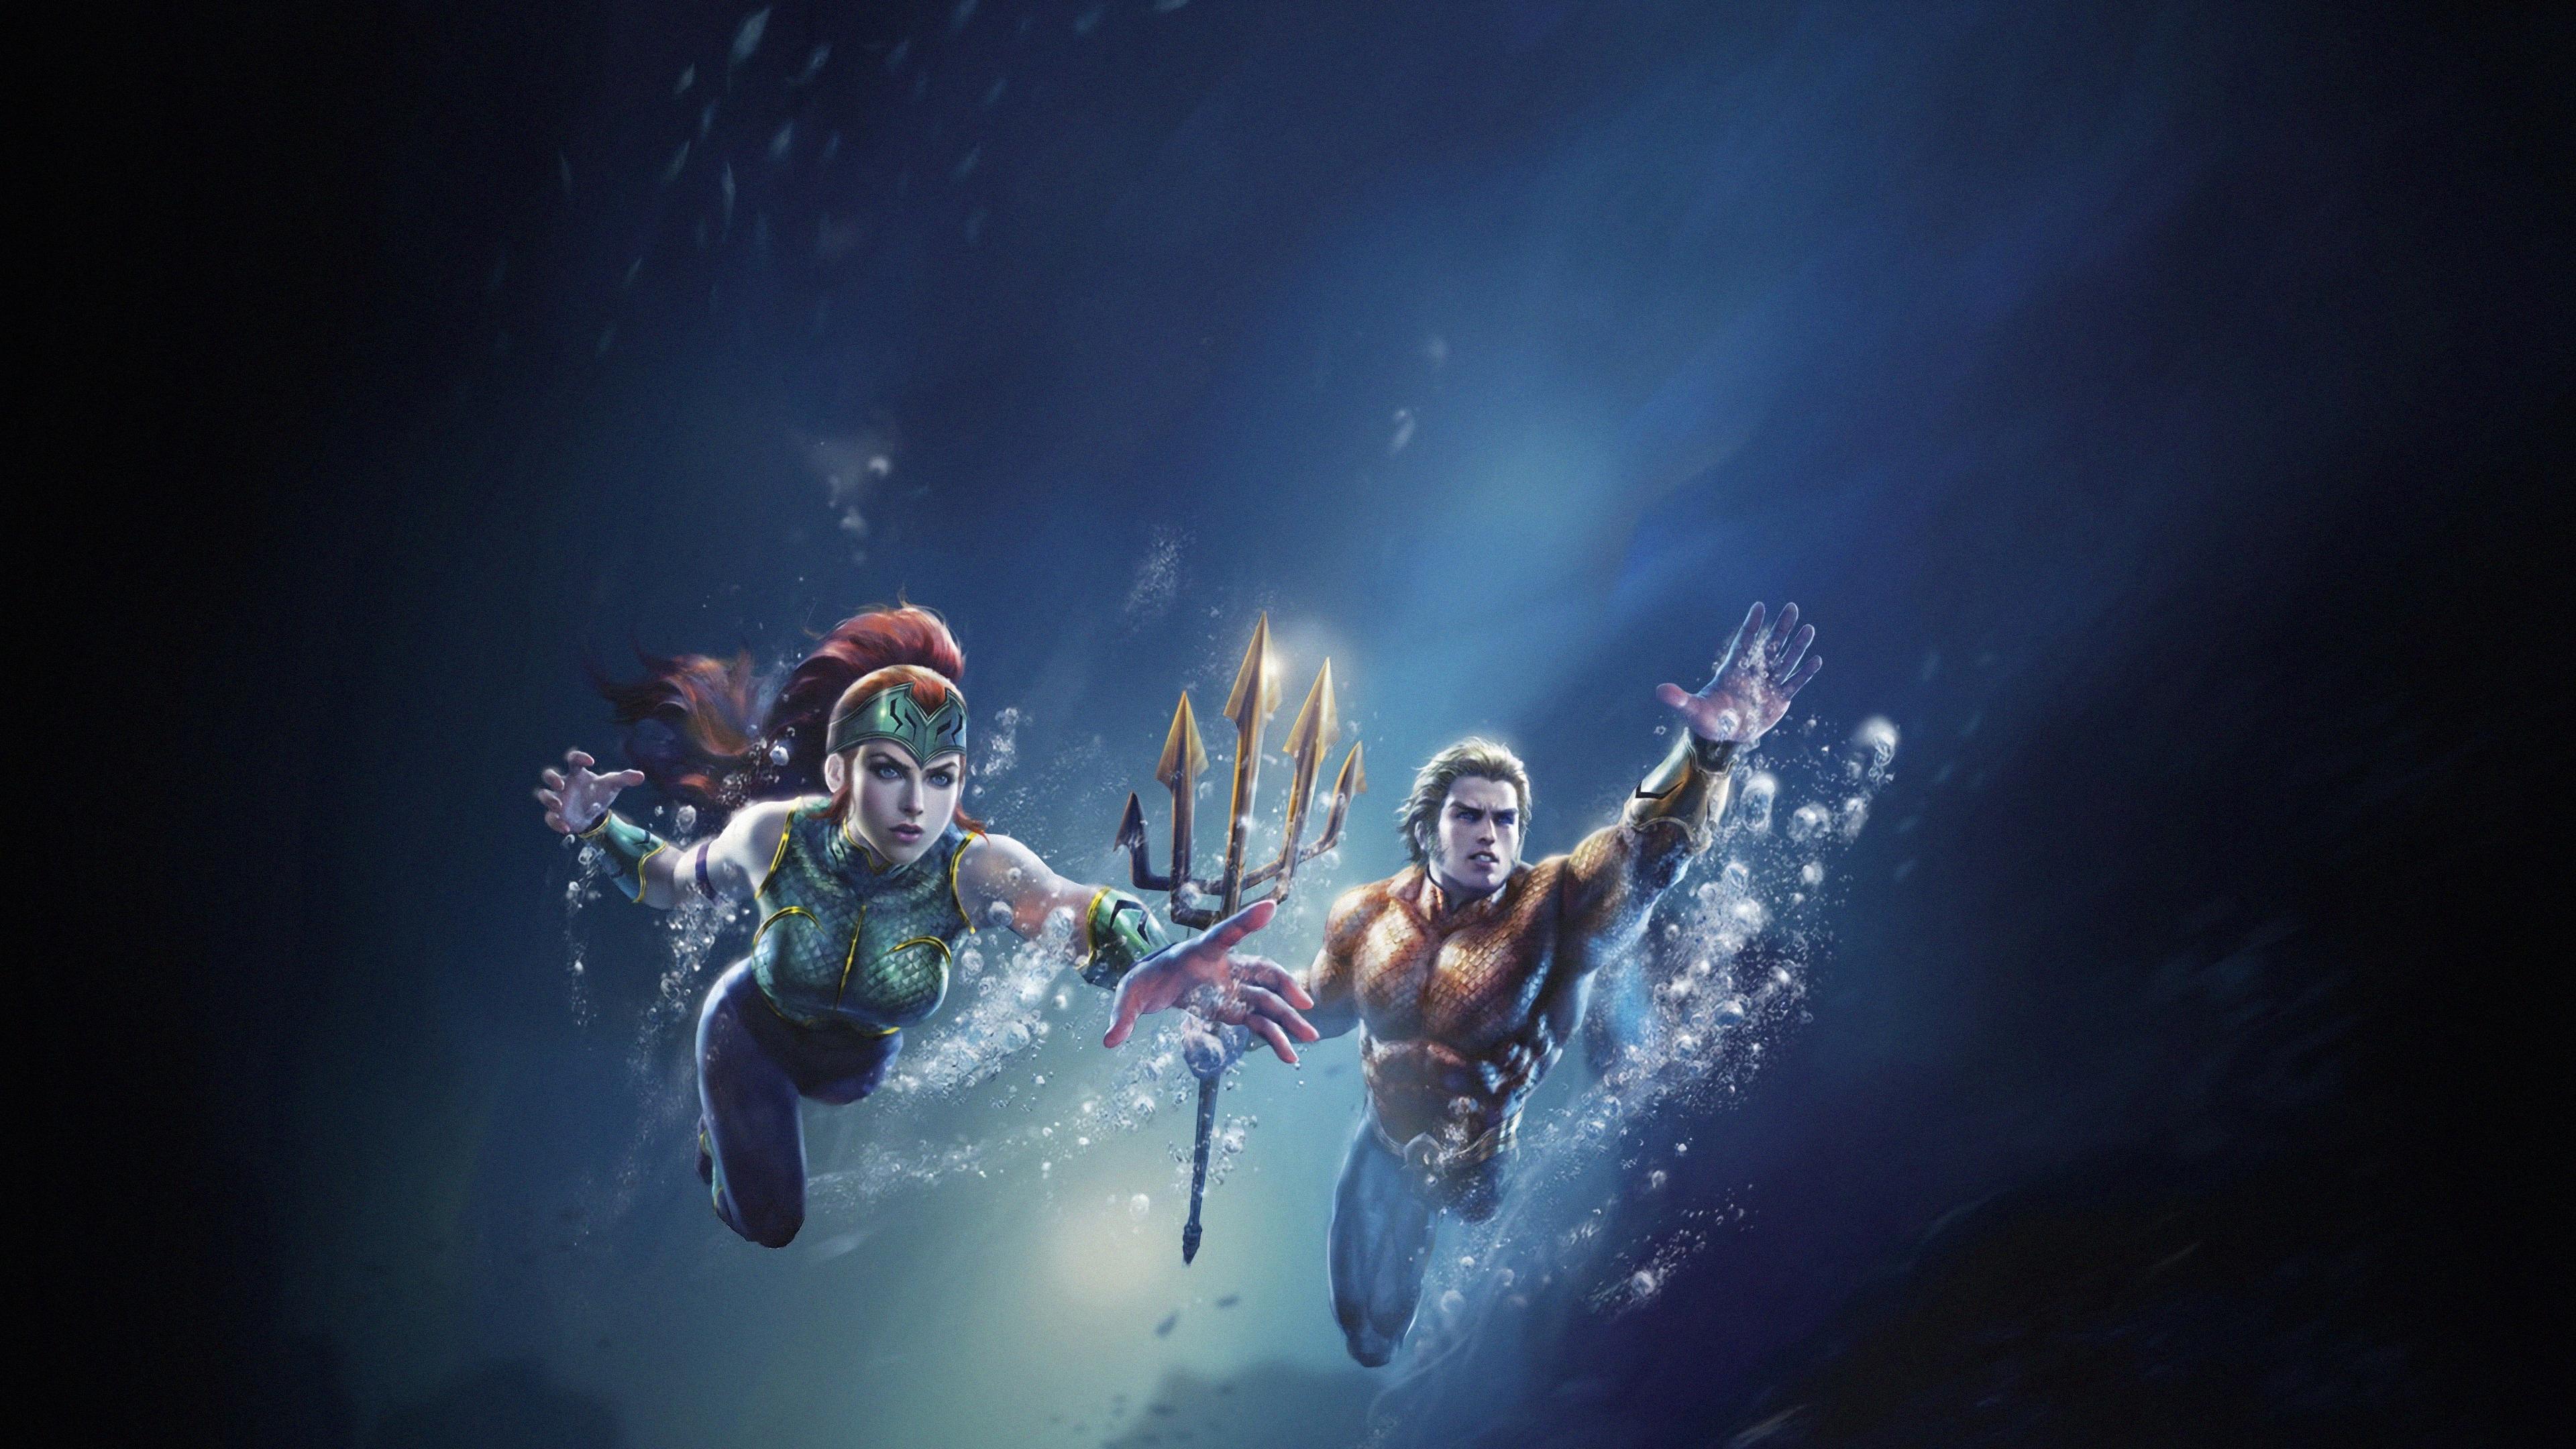 Wallpaper 4k Justice League Throne Of Atlantis 4k Wallpapers